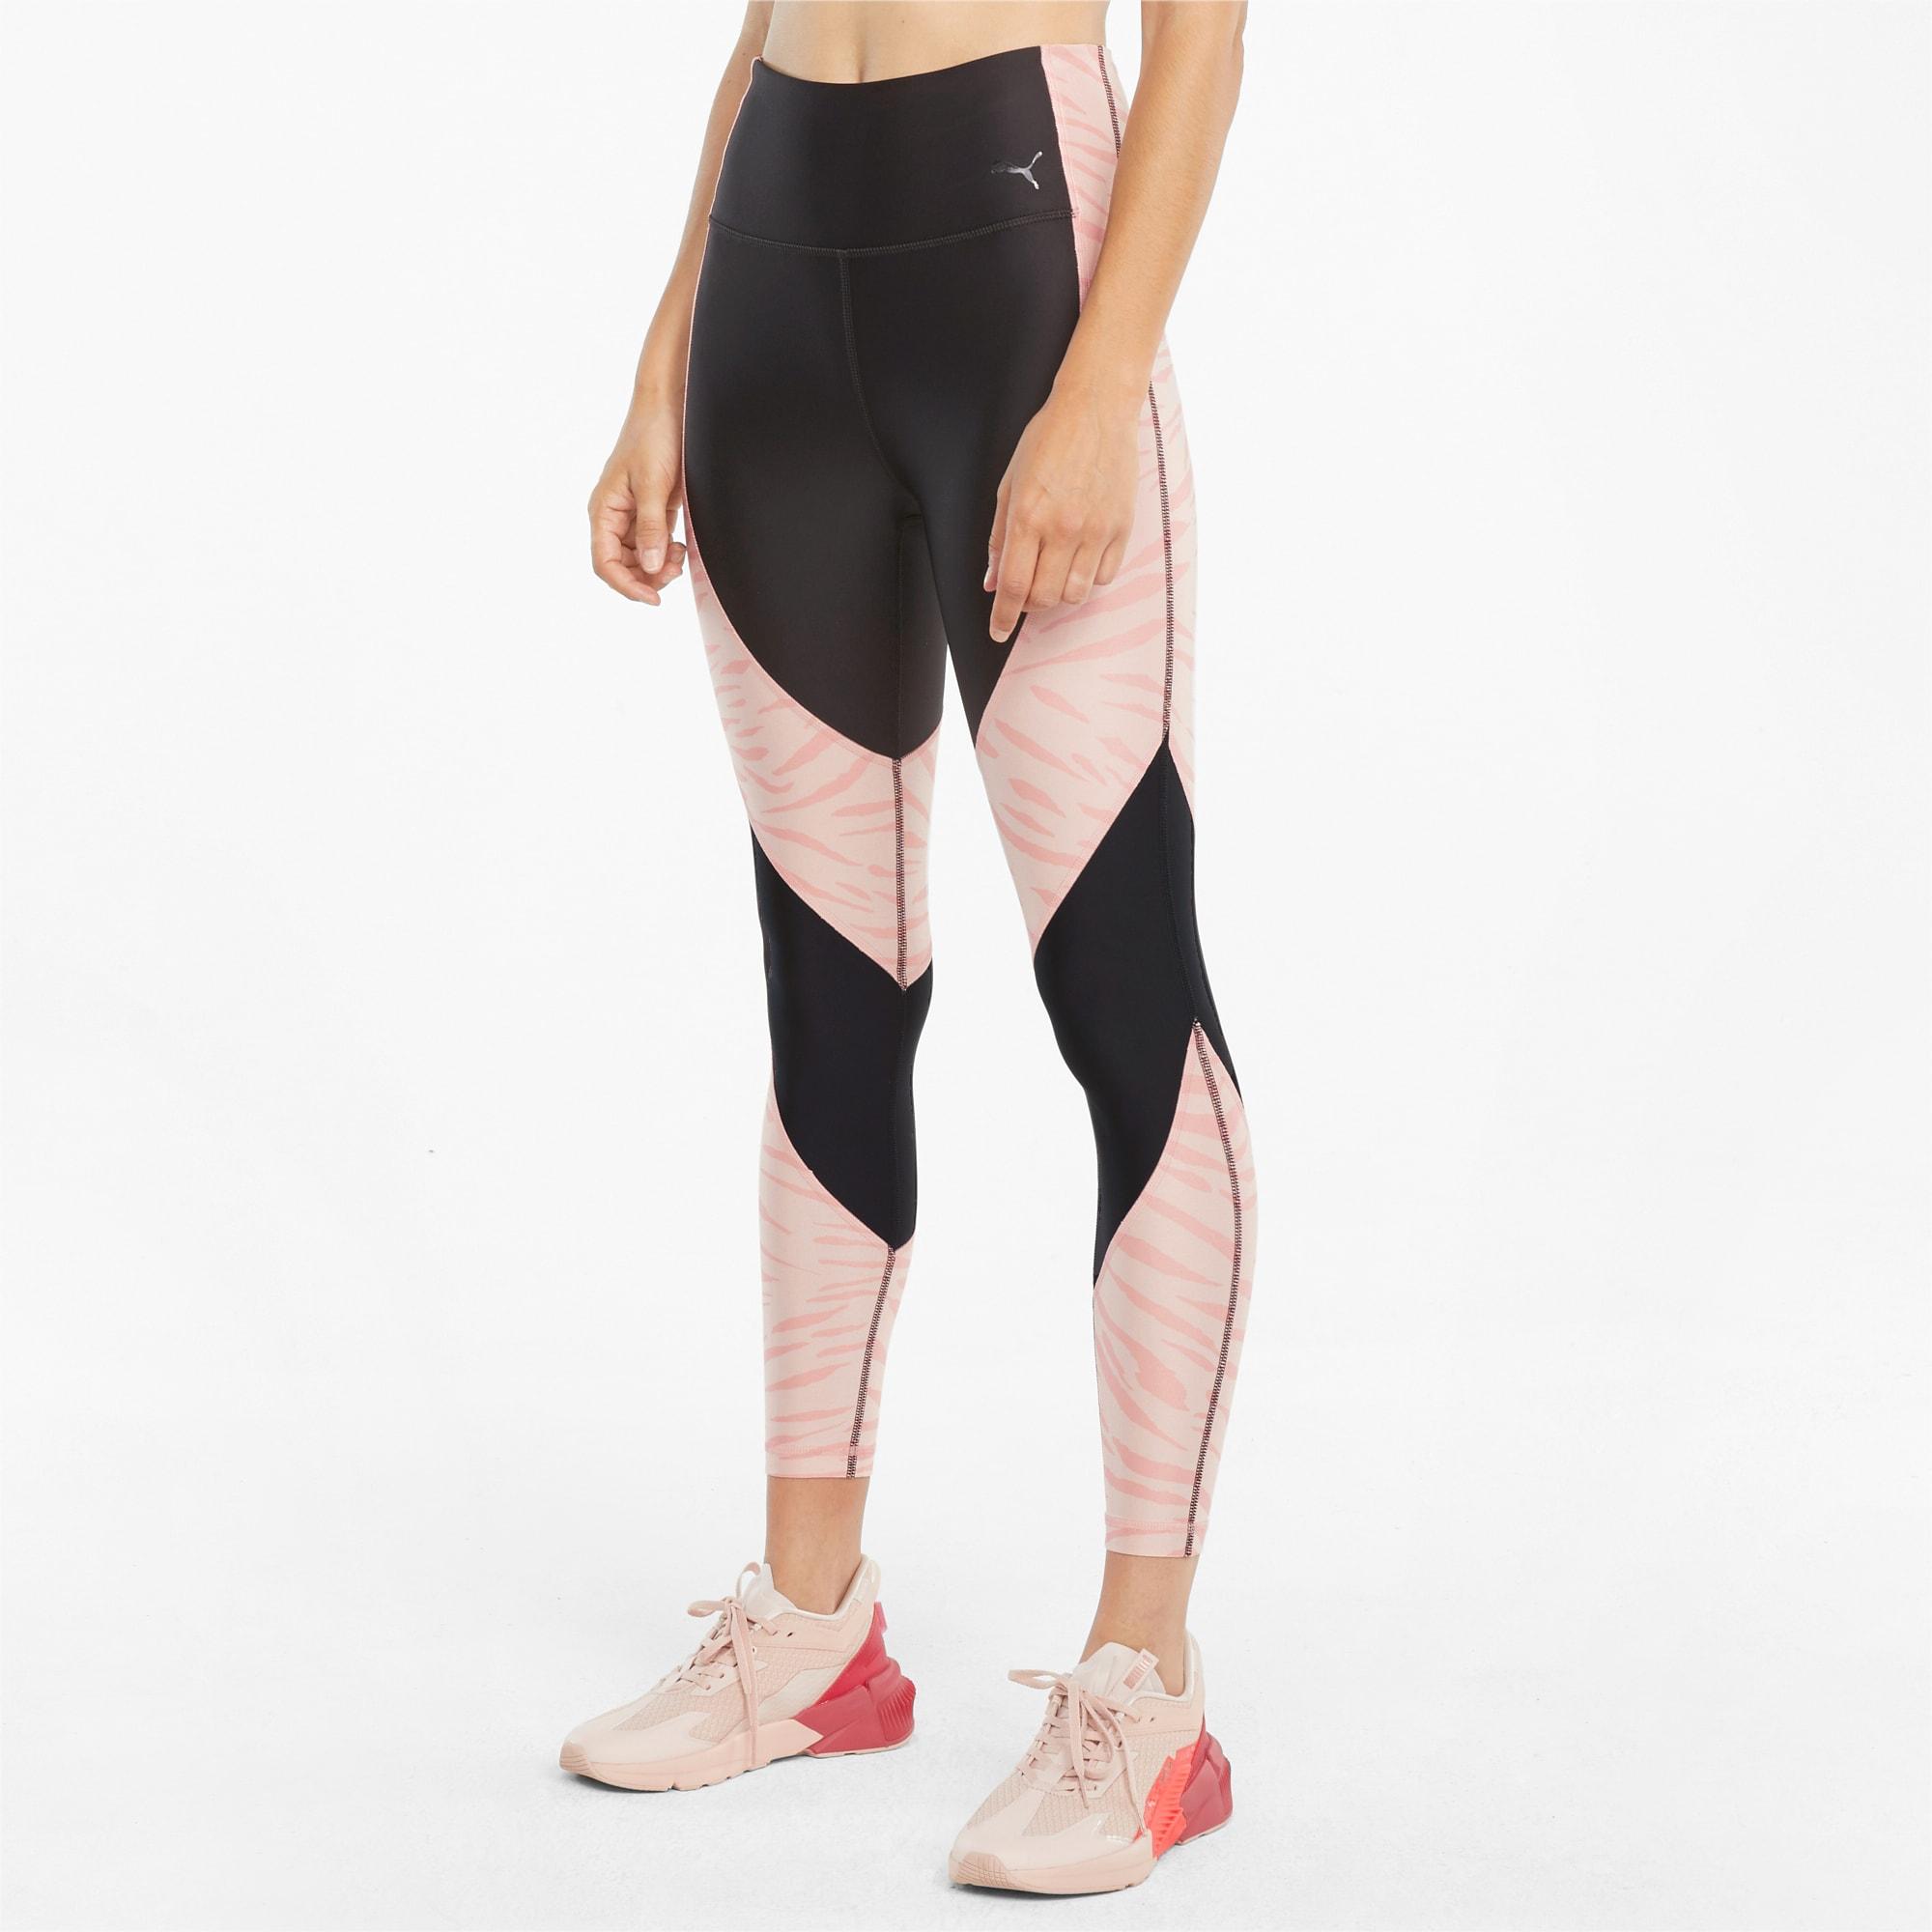 PUMA Eversculpt Print Women's Training Leggings